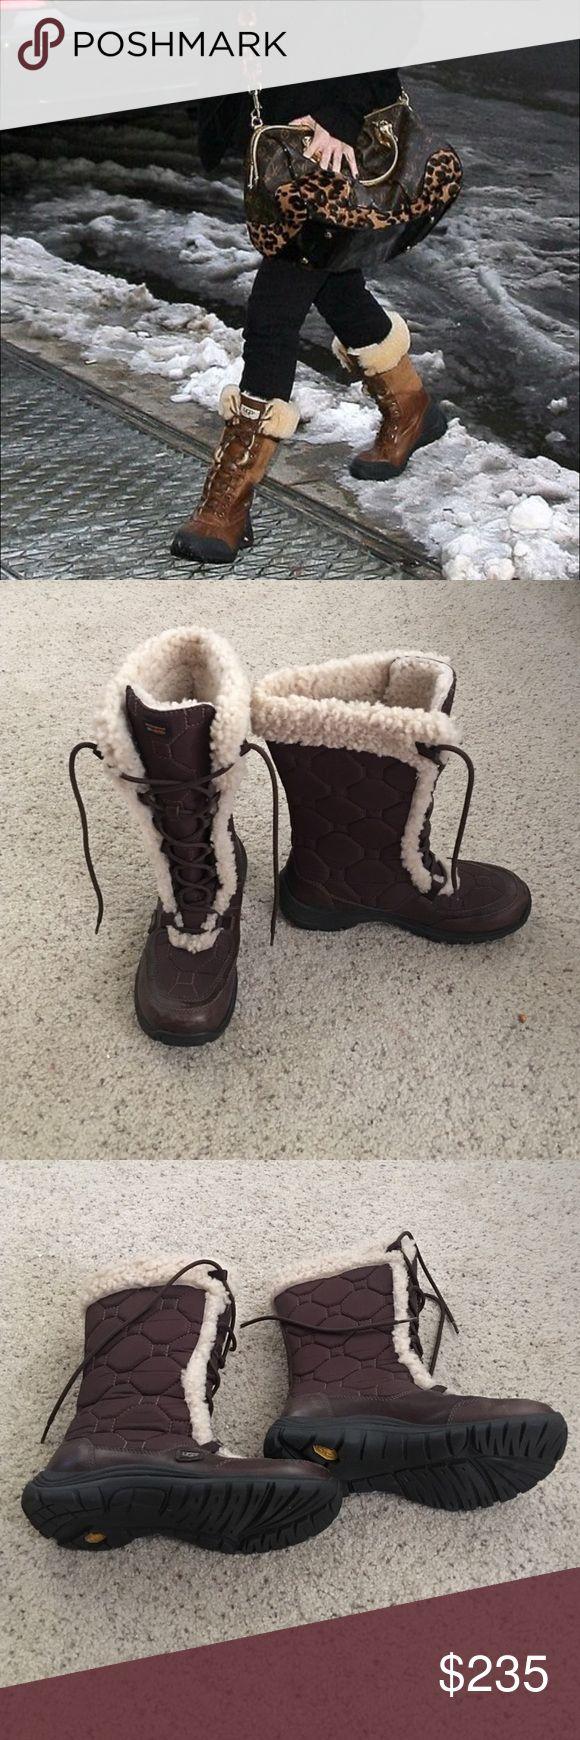 "UGG adirondack tall waterproof boots UGG ""Adirondack"" tall waterproof boots in EUC color dark brown with tan fur. UGG Shoes Winter & Rain Boots"